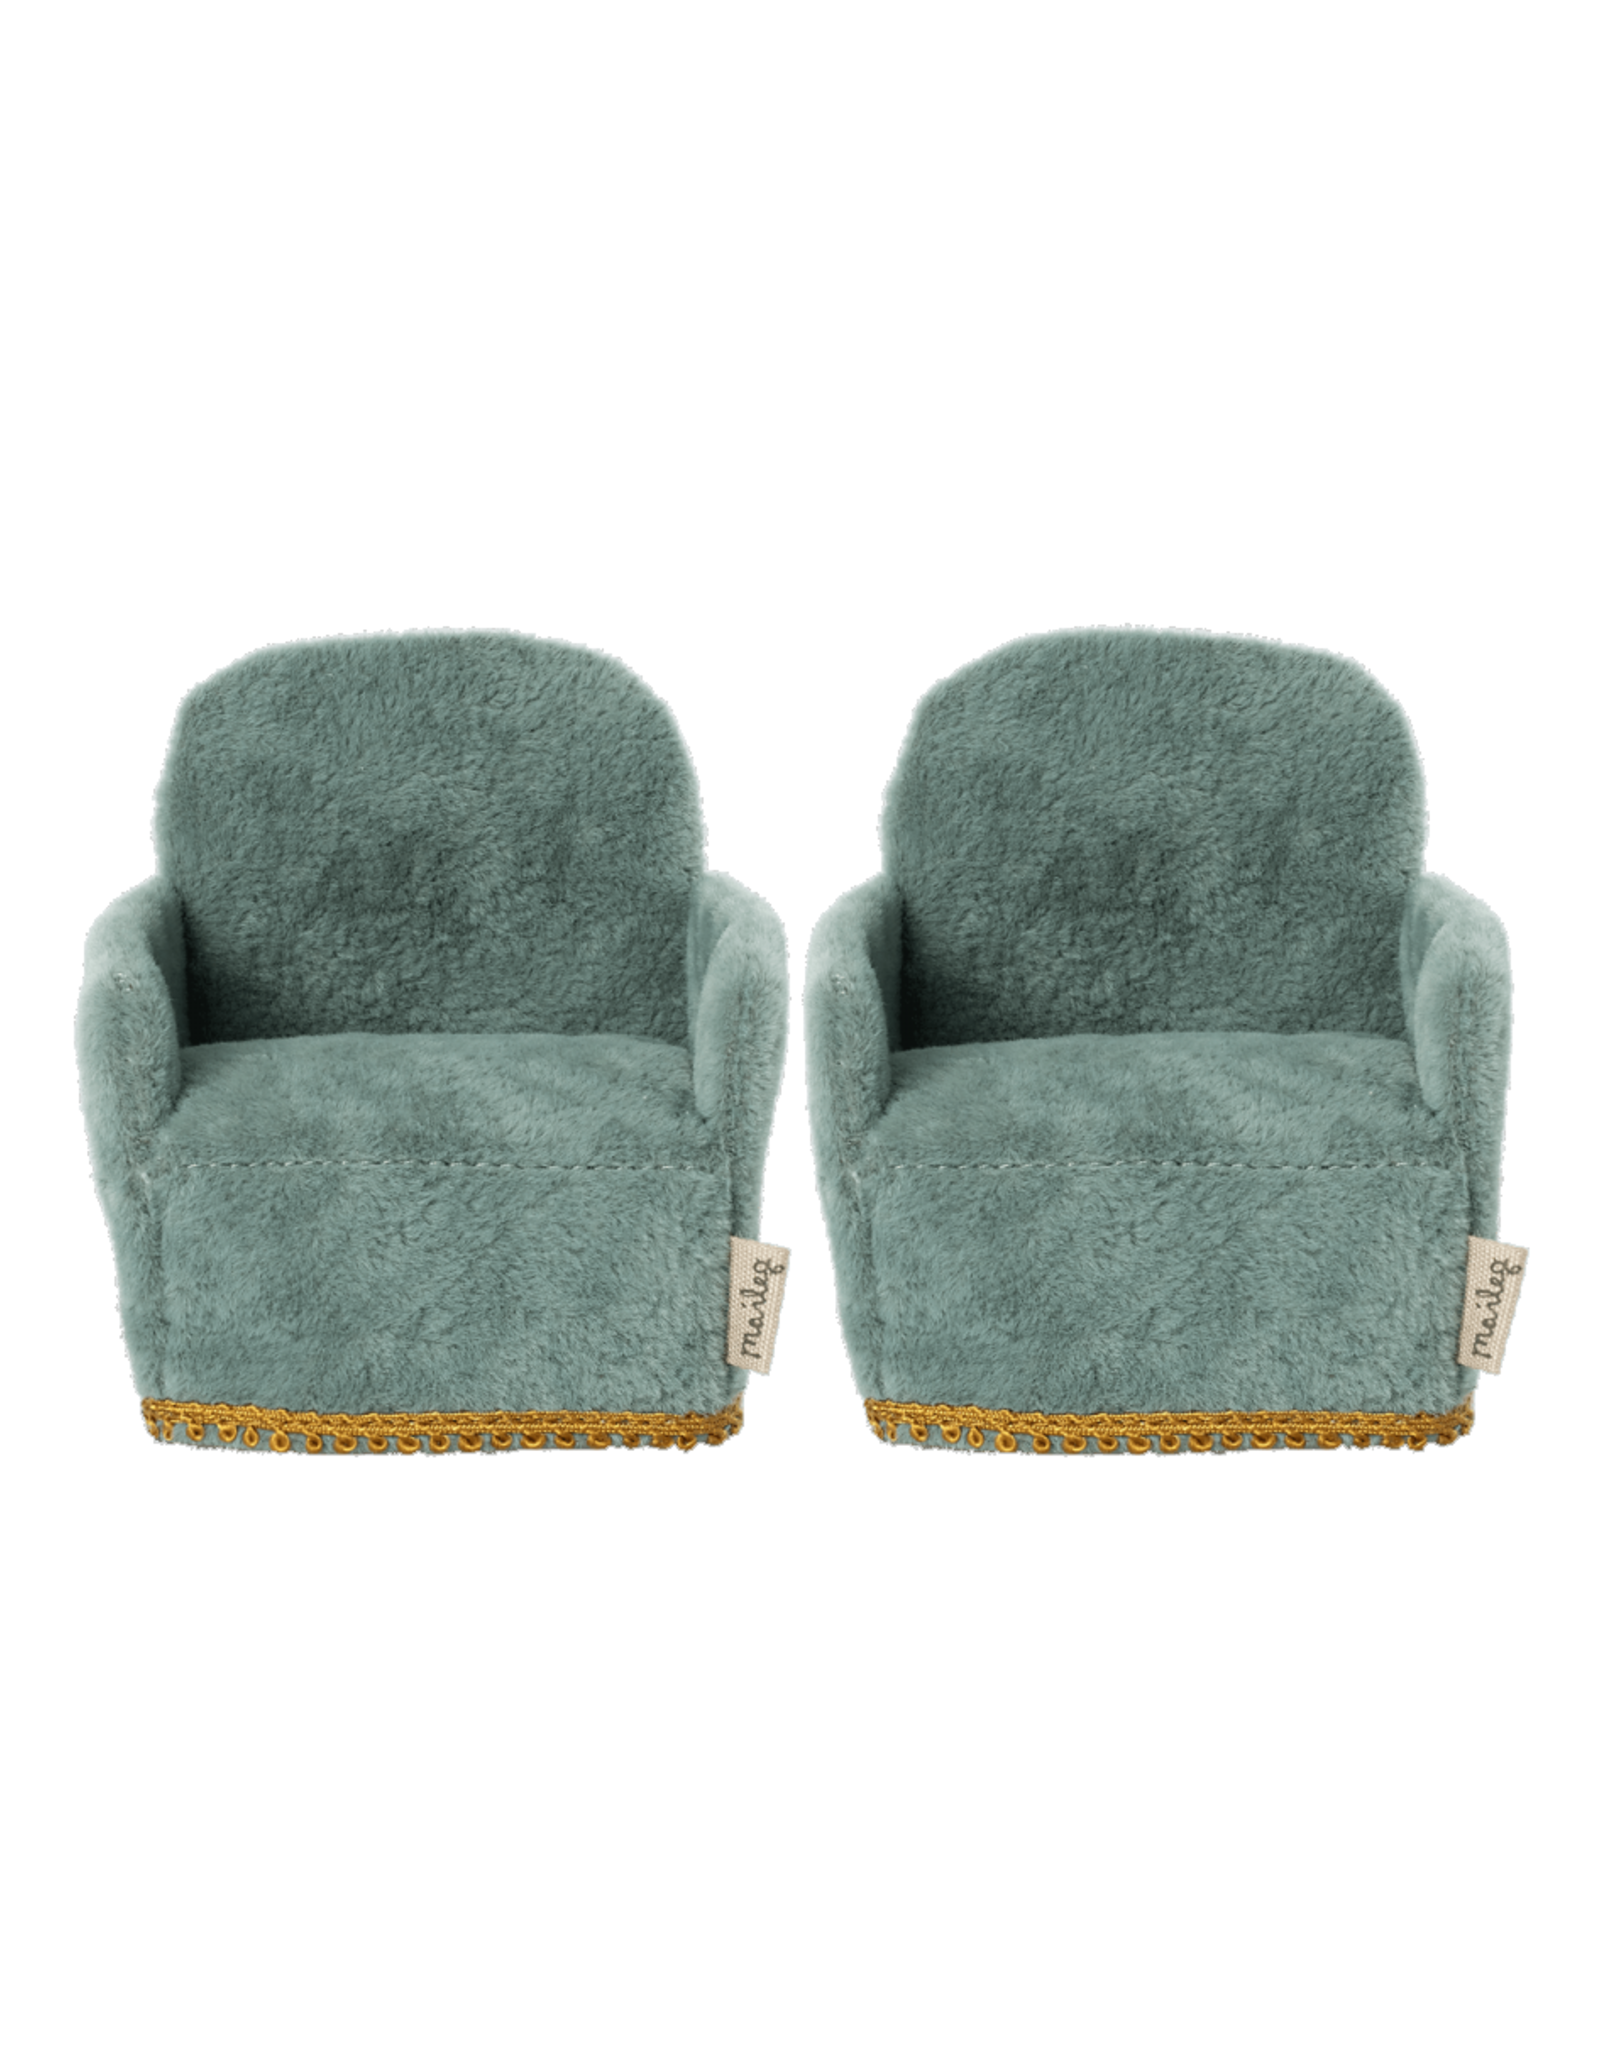 Maileg Mouse Chair Pair - Teal